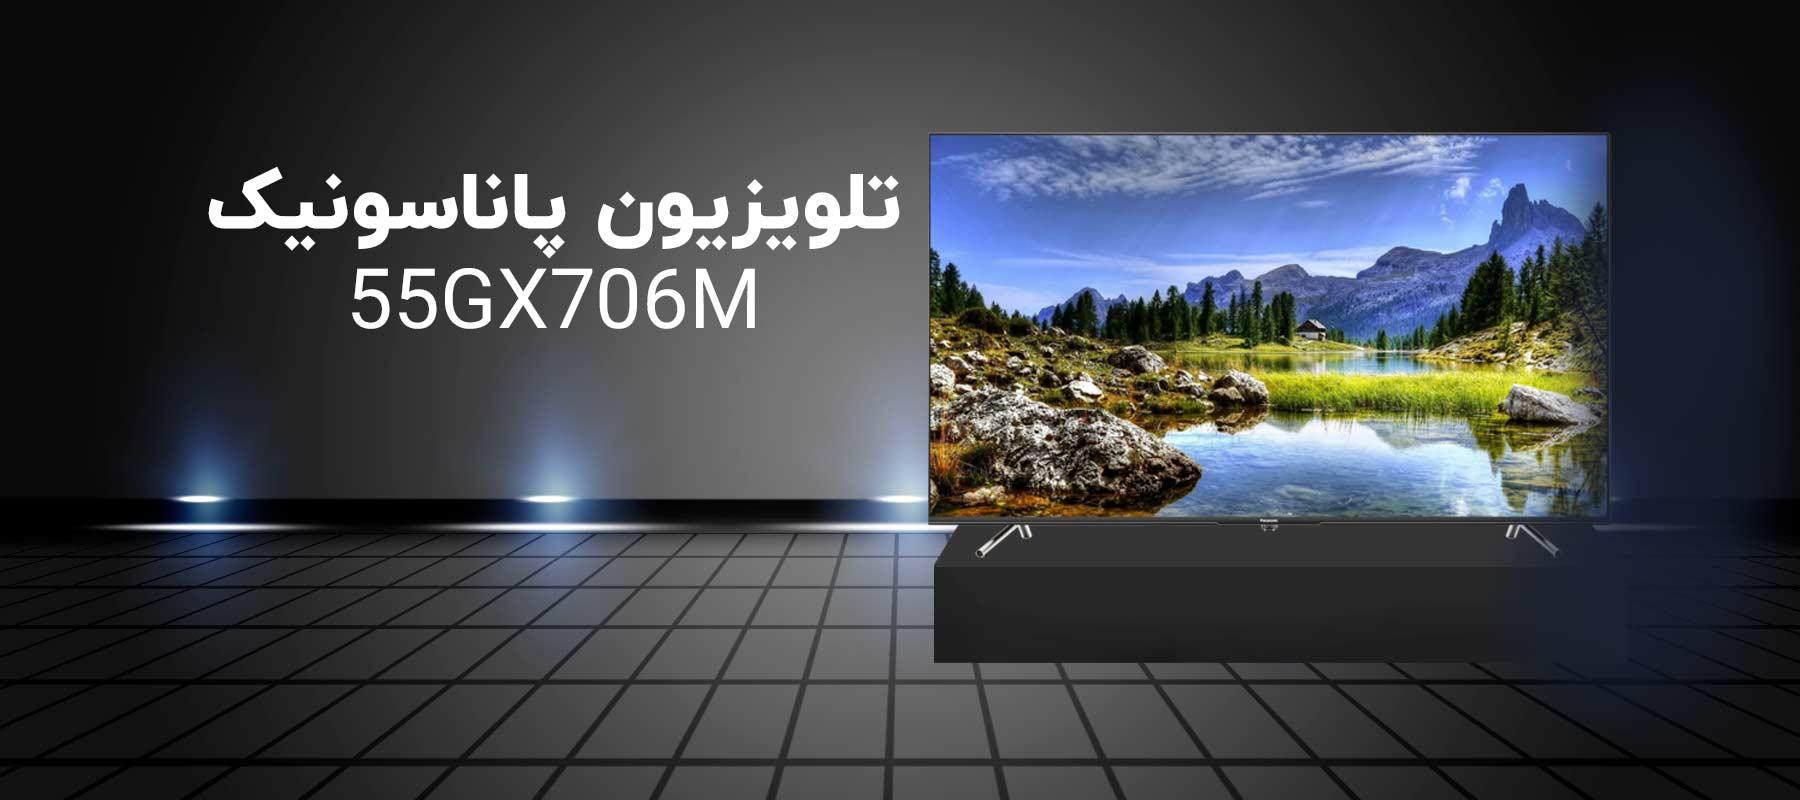 بررسی تلویزیون پاناسونیک 55GX706M